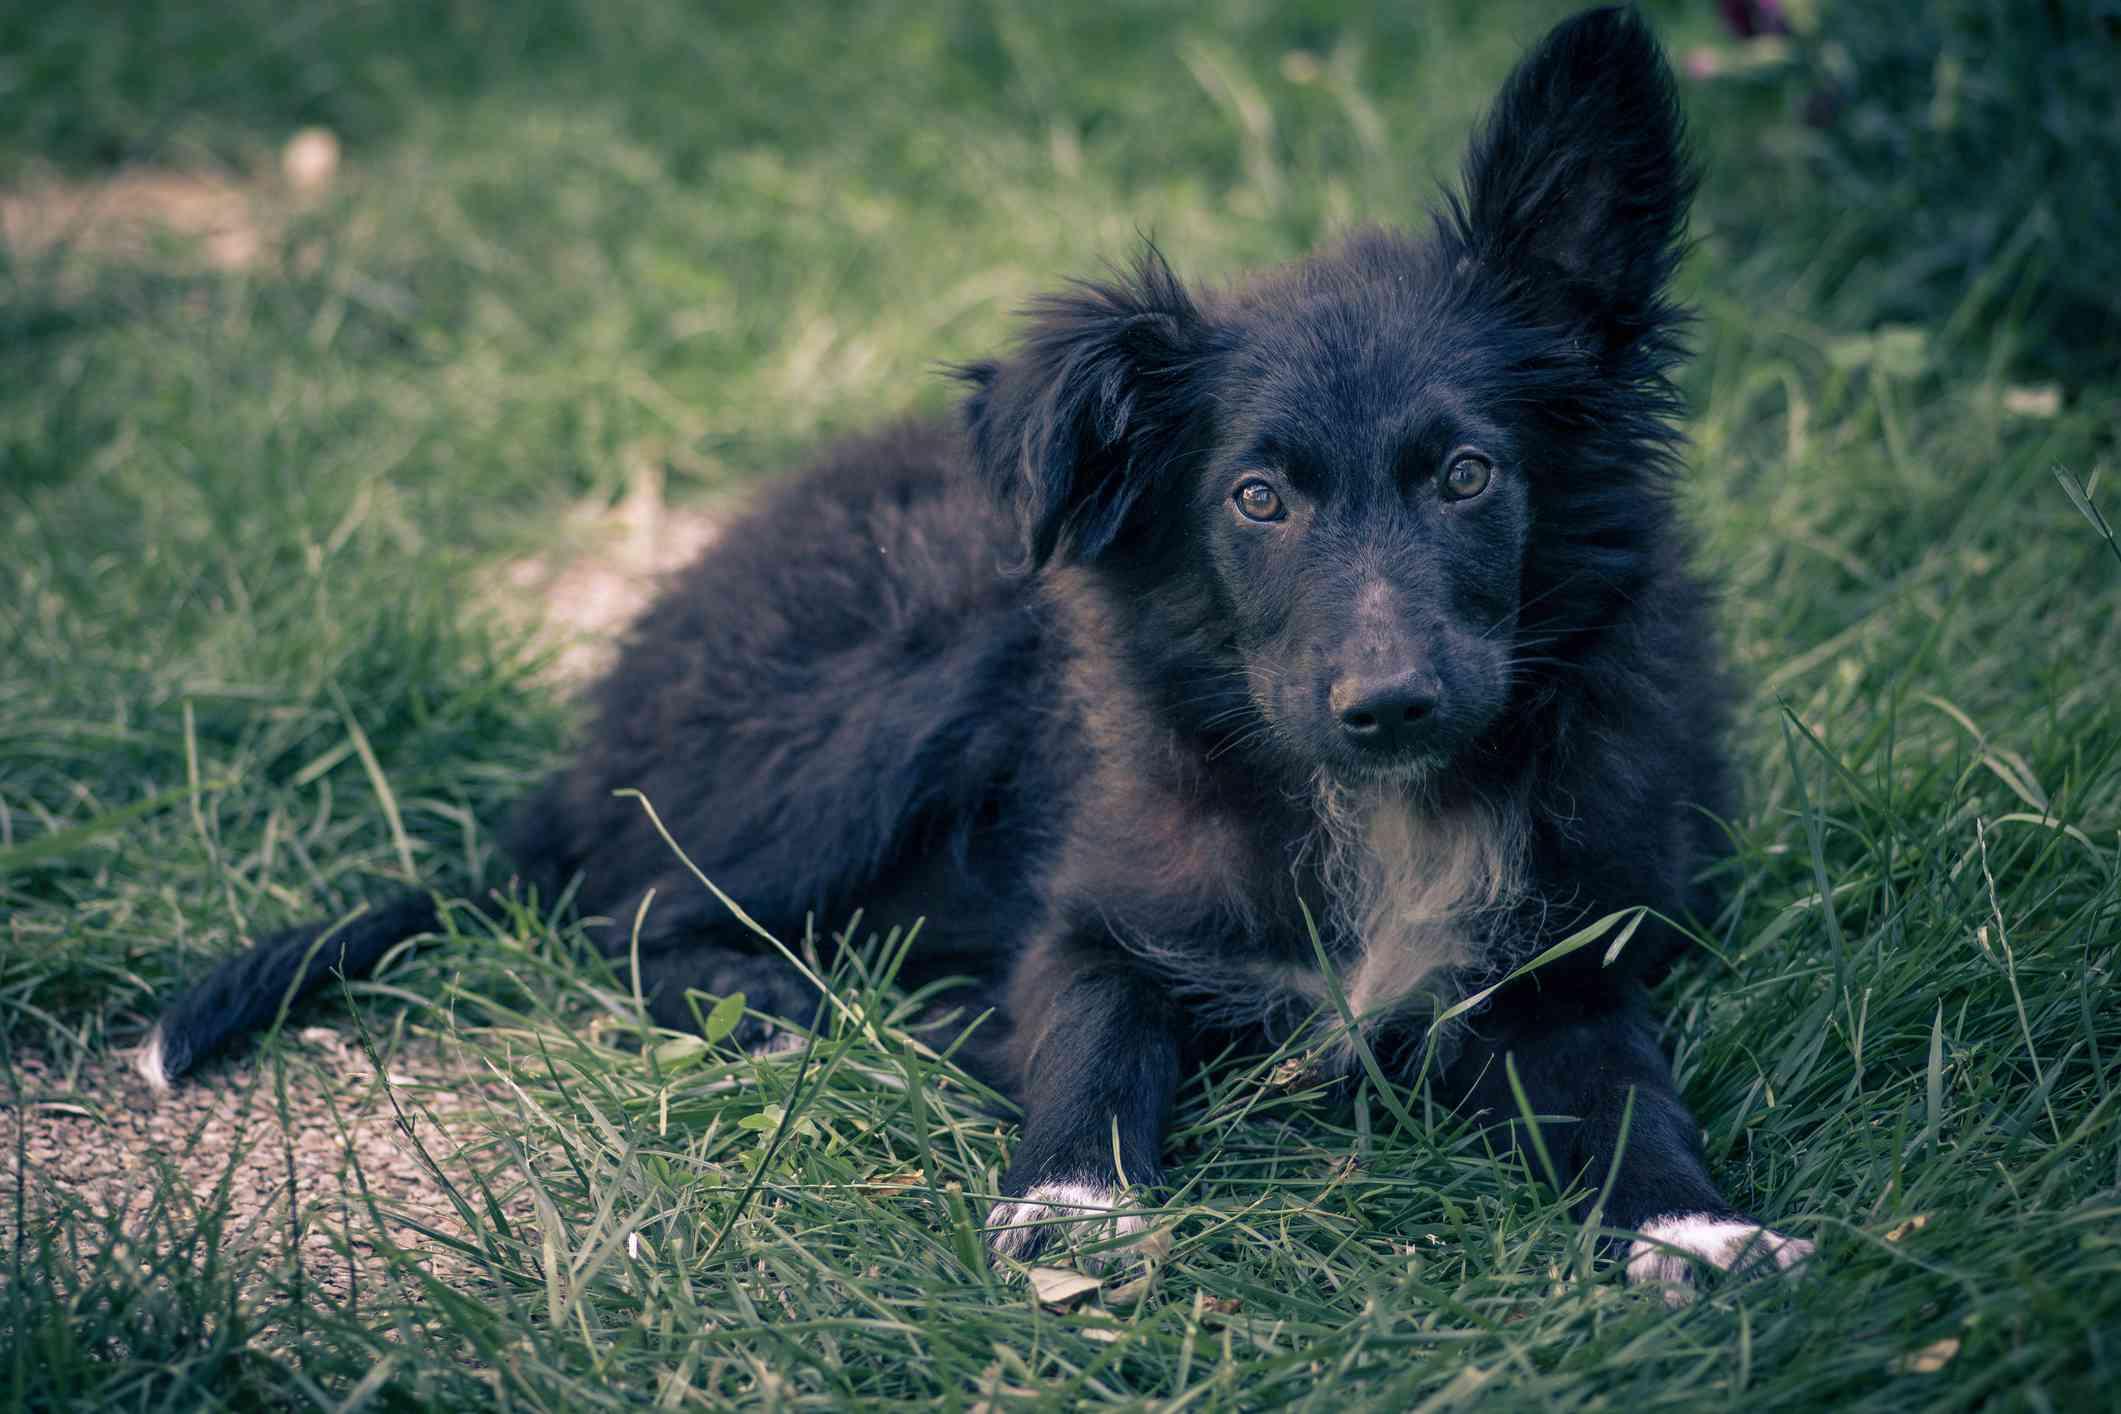 A Puppy Croatian Sheepdog lying in the grass